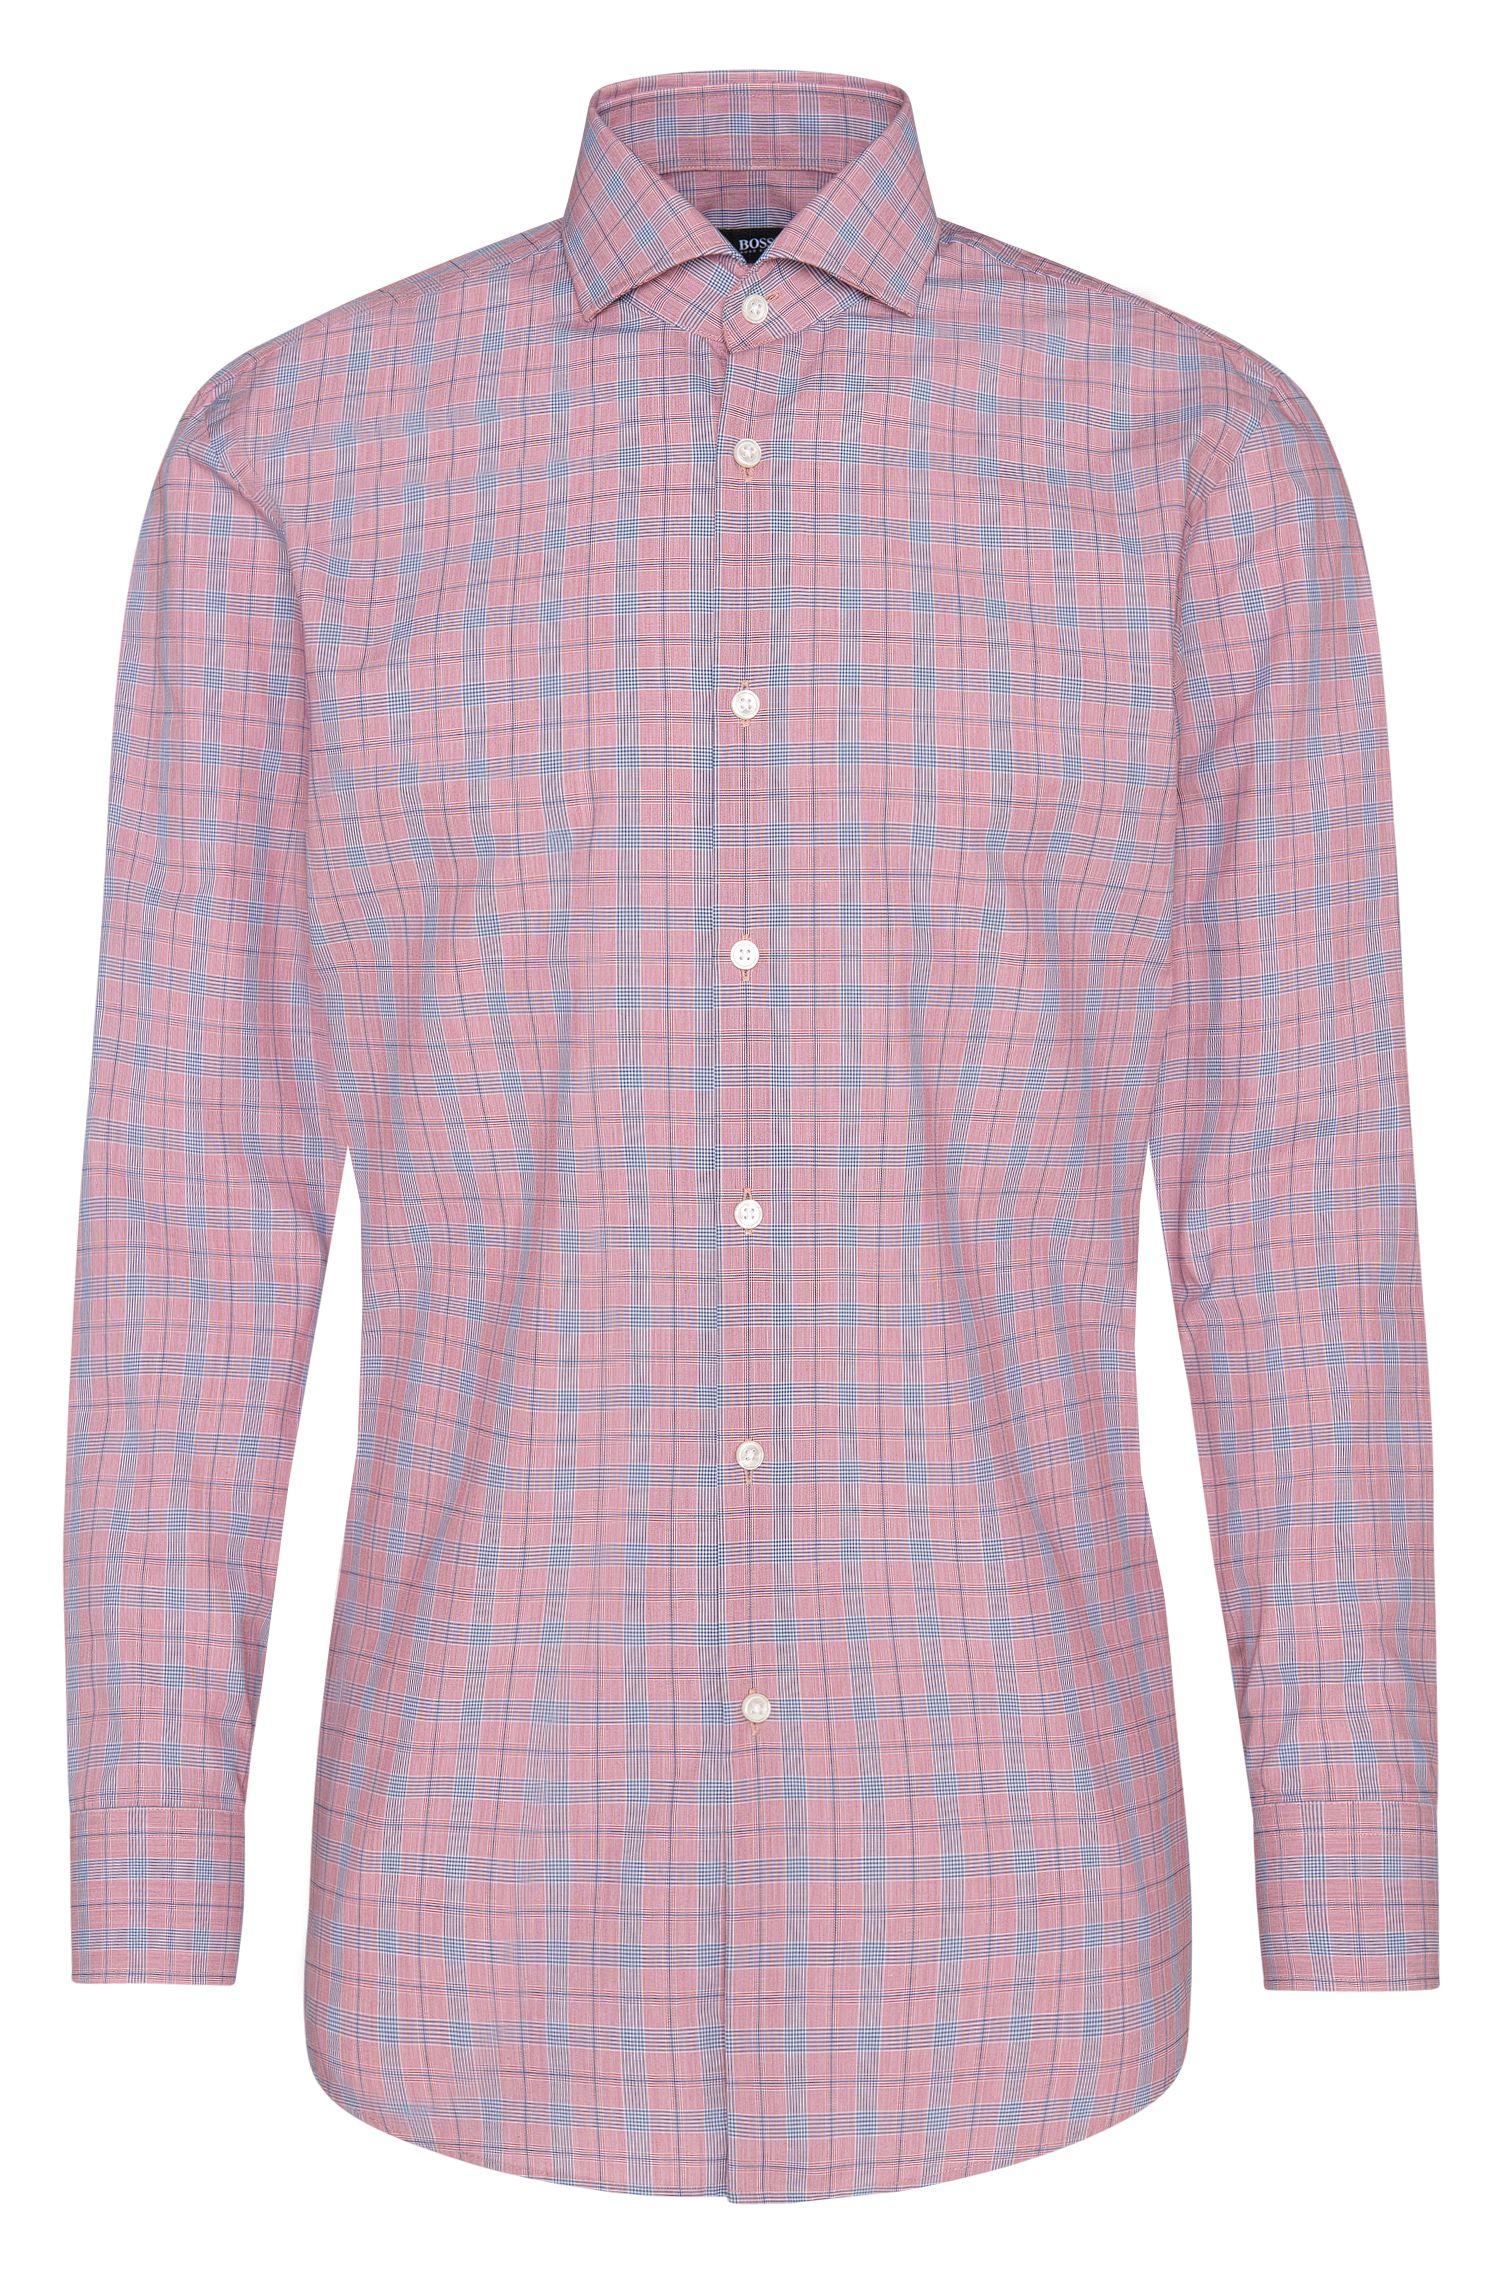 Kariertes Slim-Fit Hemd aus Baumwolle: 'Mark US'